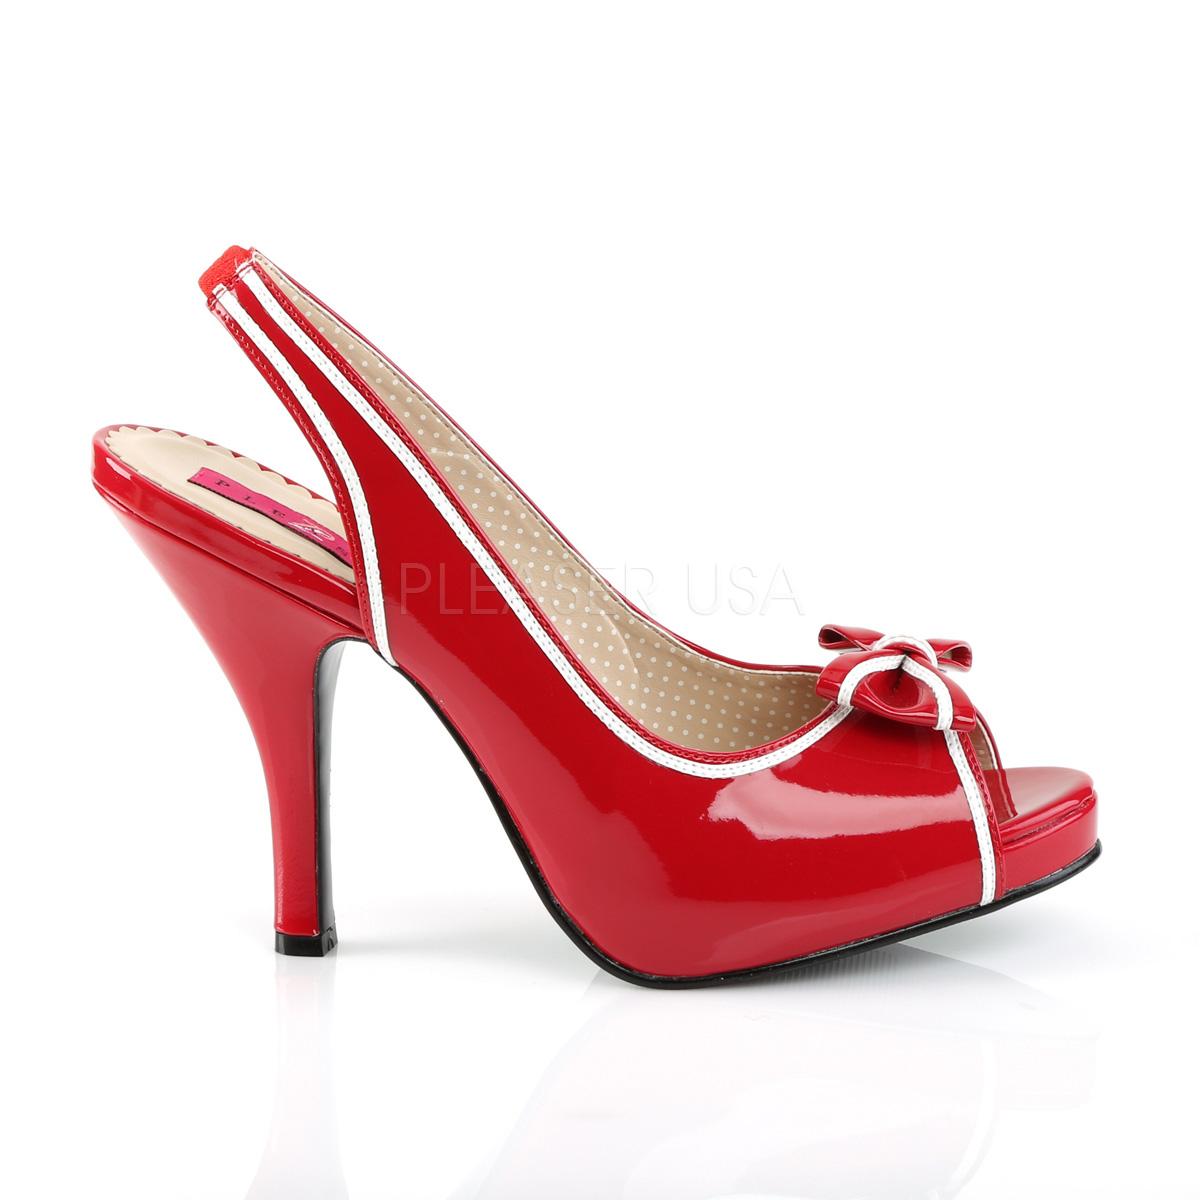 Pleaser Pink Label PINUP-10 4 1/2inch Heel, 3/4inch Hidden P/F Peep Toe Slingback Sandal W/Bow◆取り寄せ